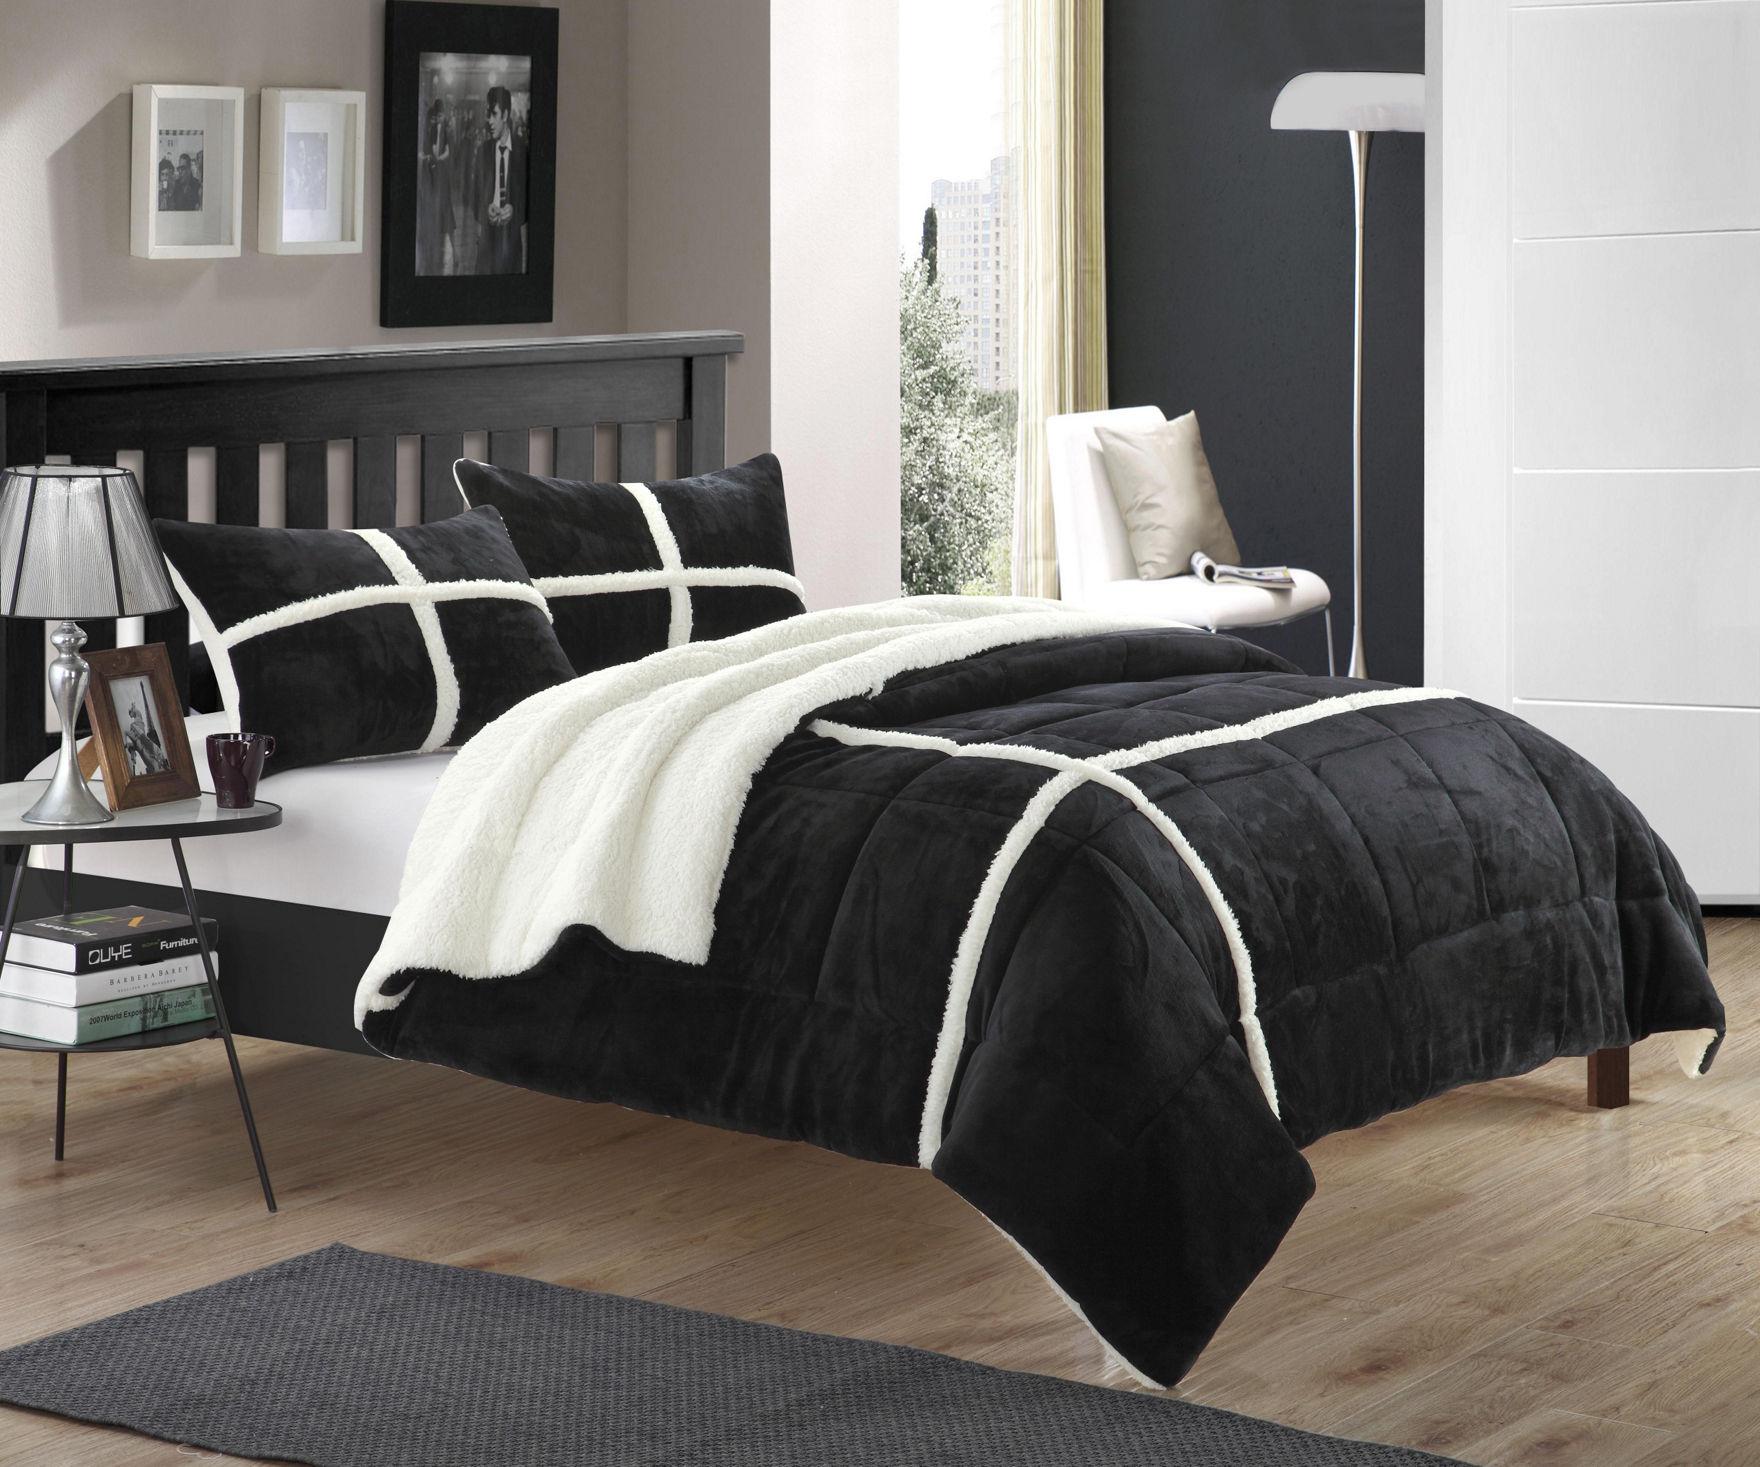 Wayfair Black Bedroom Sets Black And White Bedding For